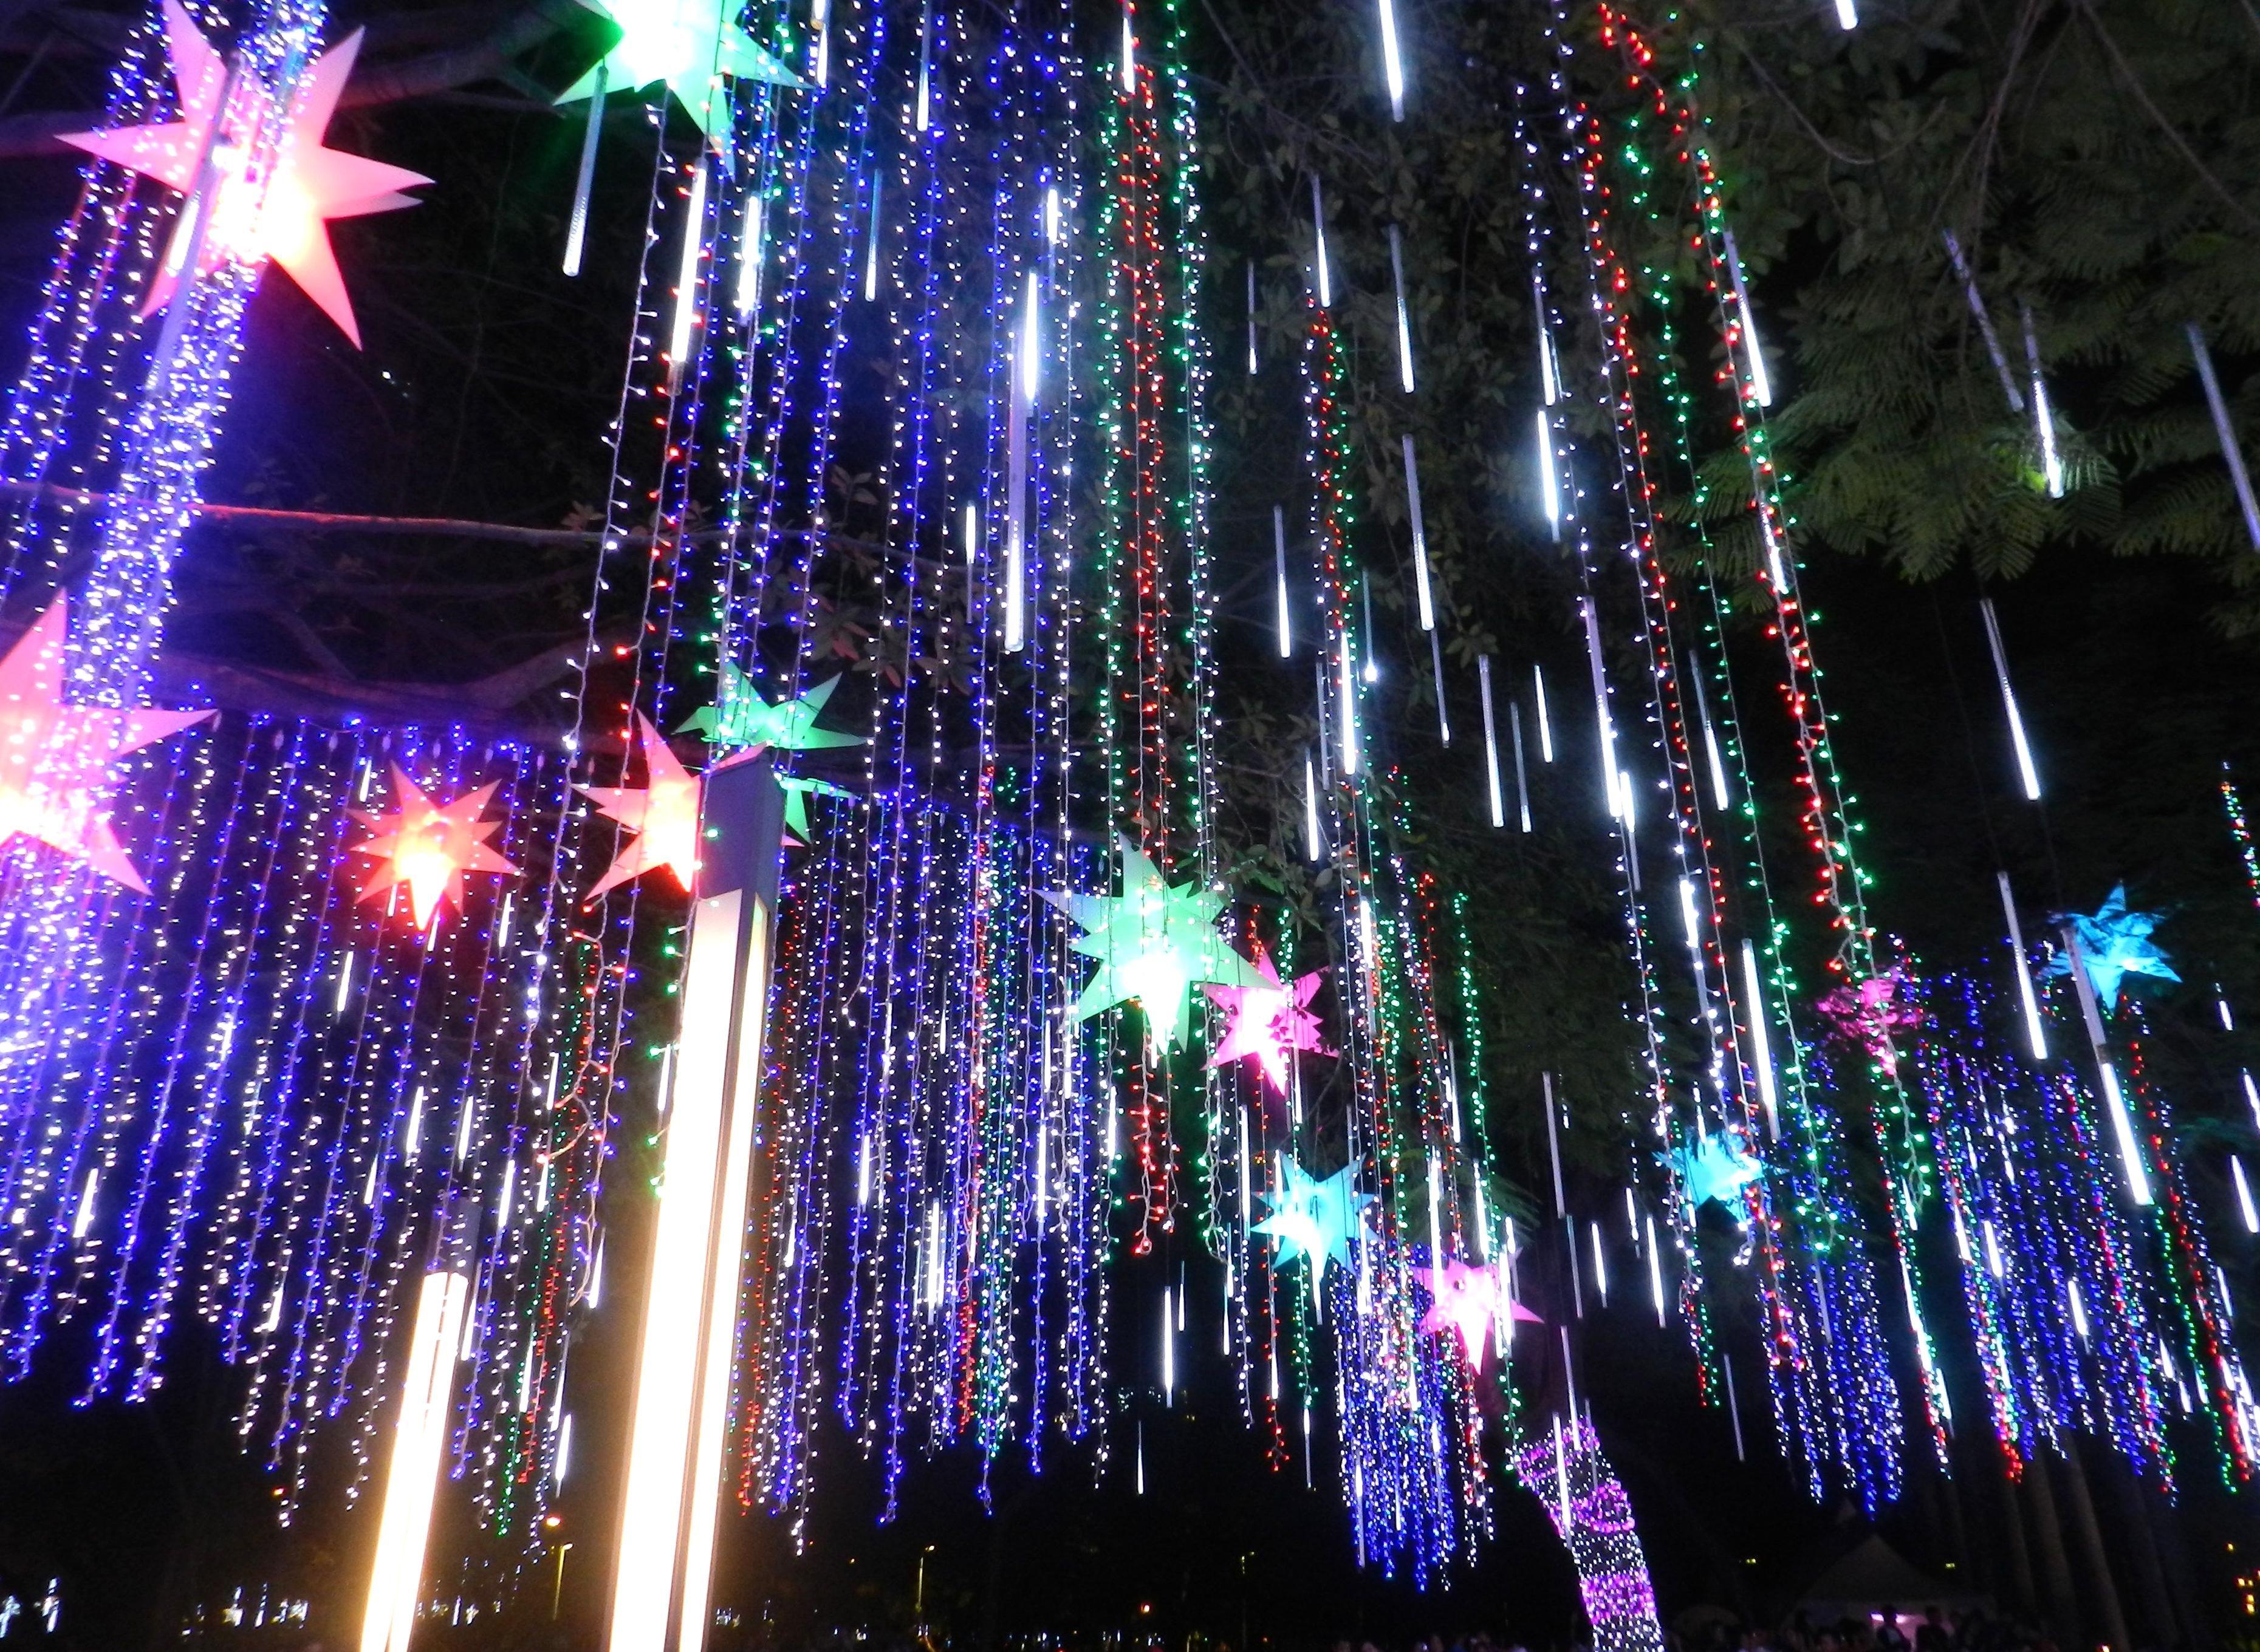 064e64972b57cb0770df9bb06627f809 - Ayala Triangle Gardens Lights & Sounds Show Schedule